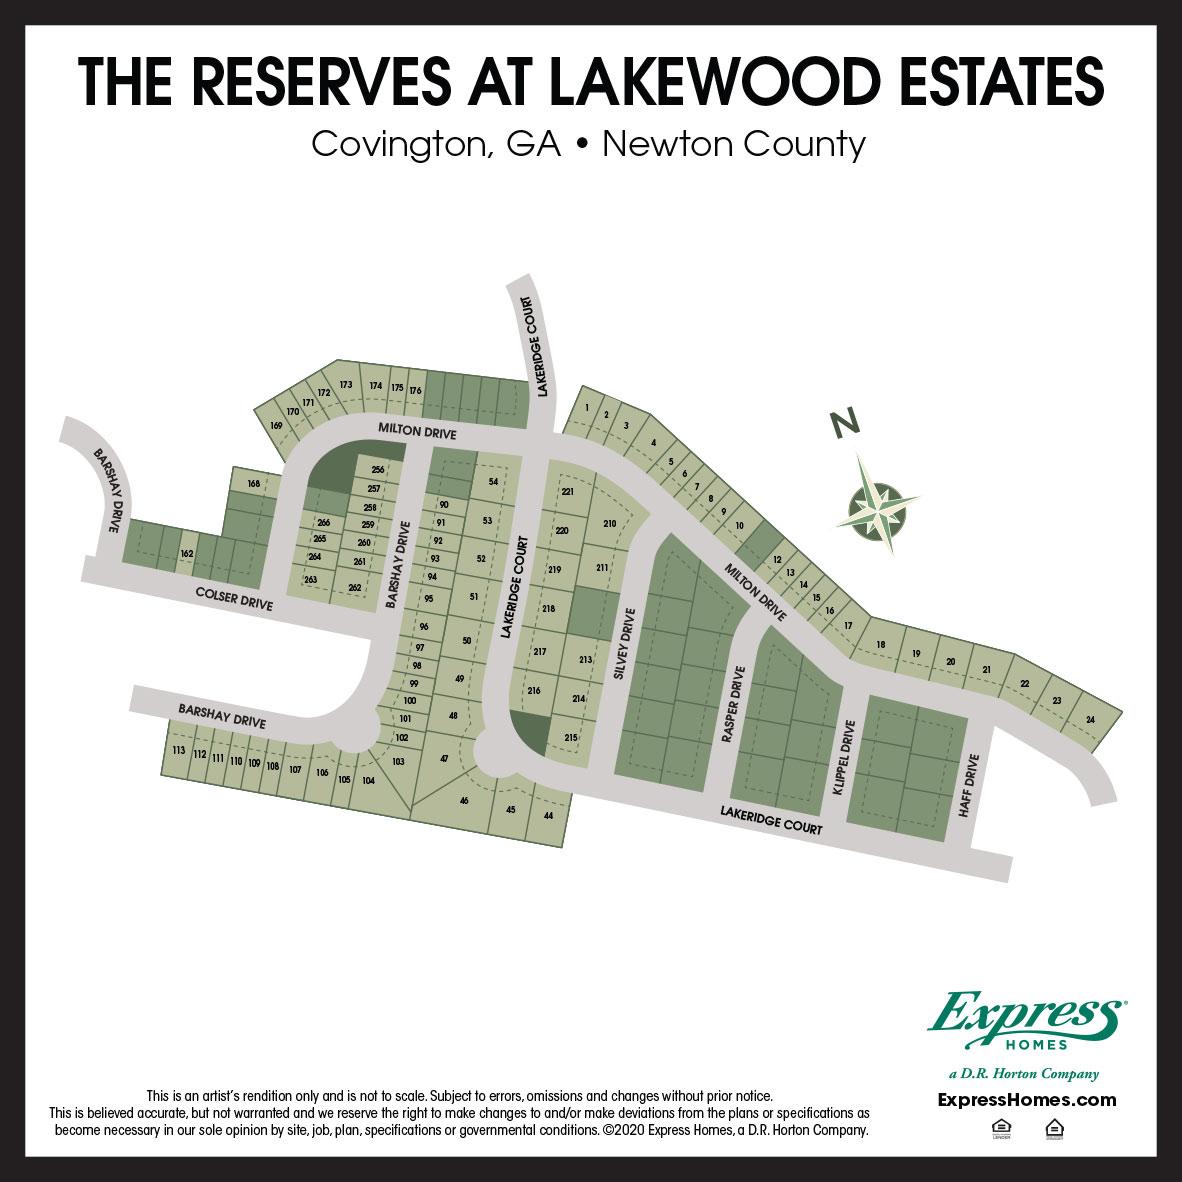 New Homes In The Reserves At Lakewood Estates Covington Ga D R Horton